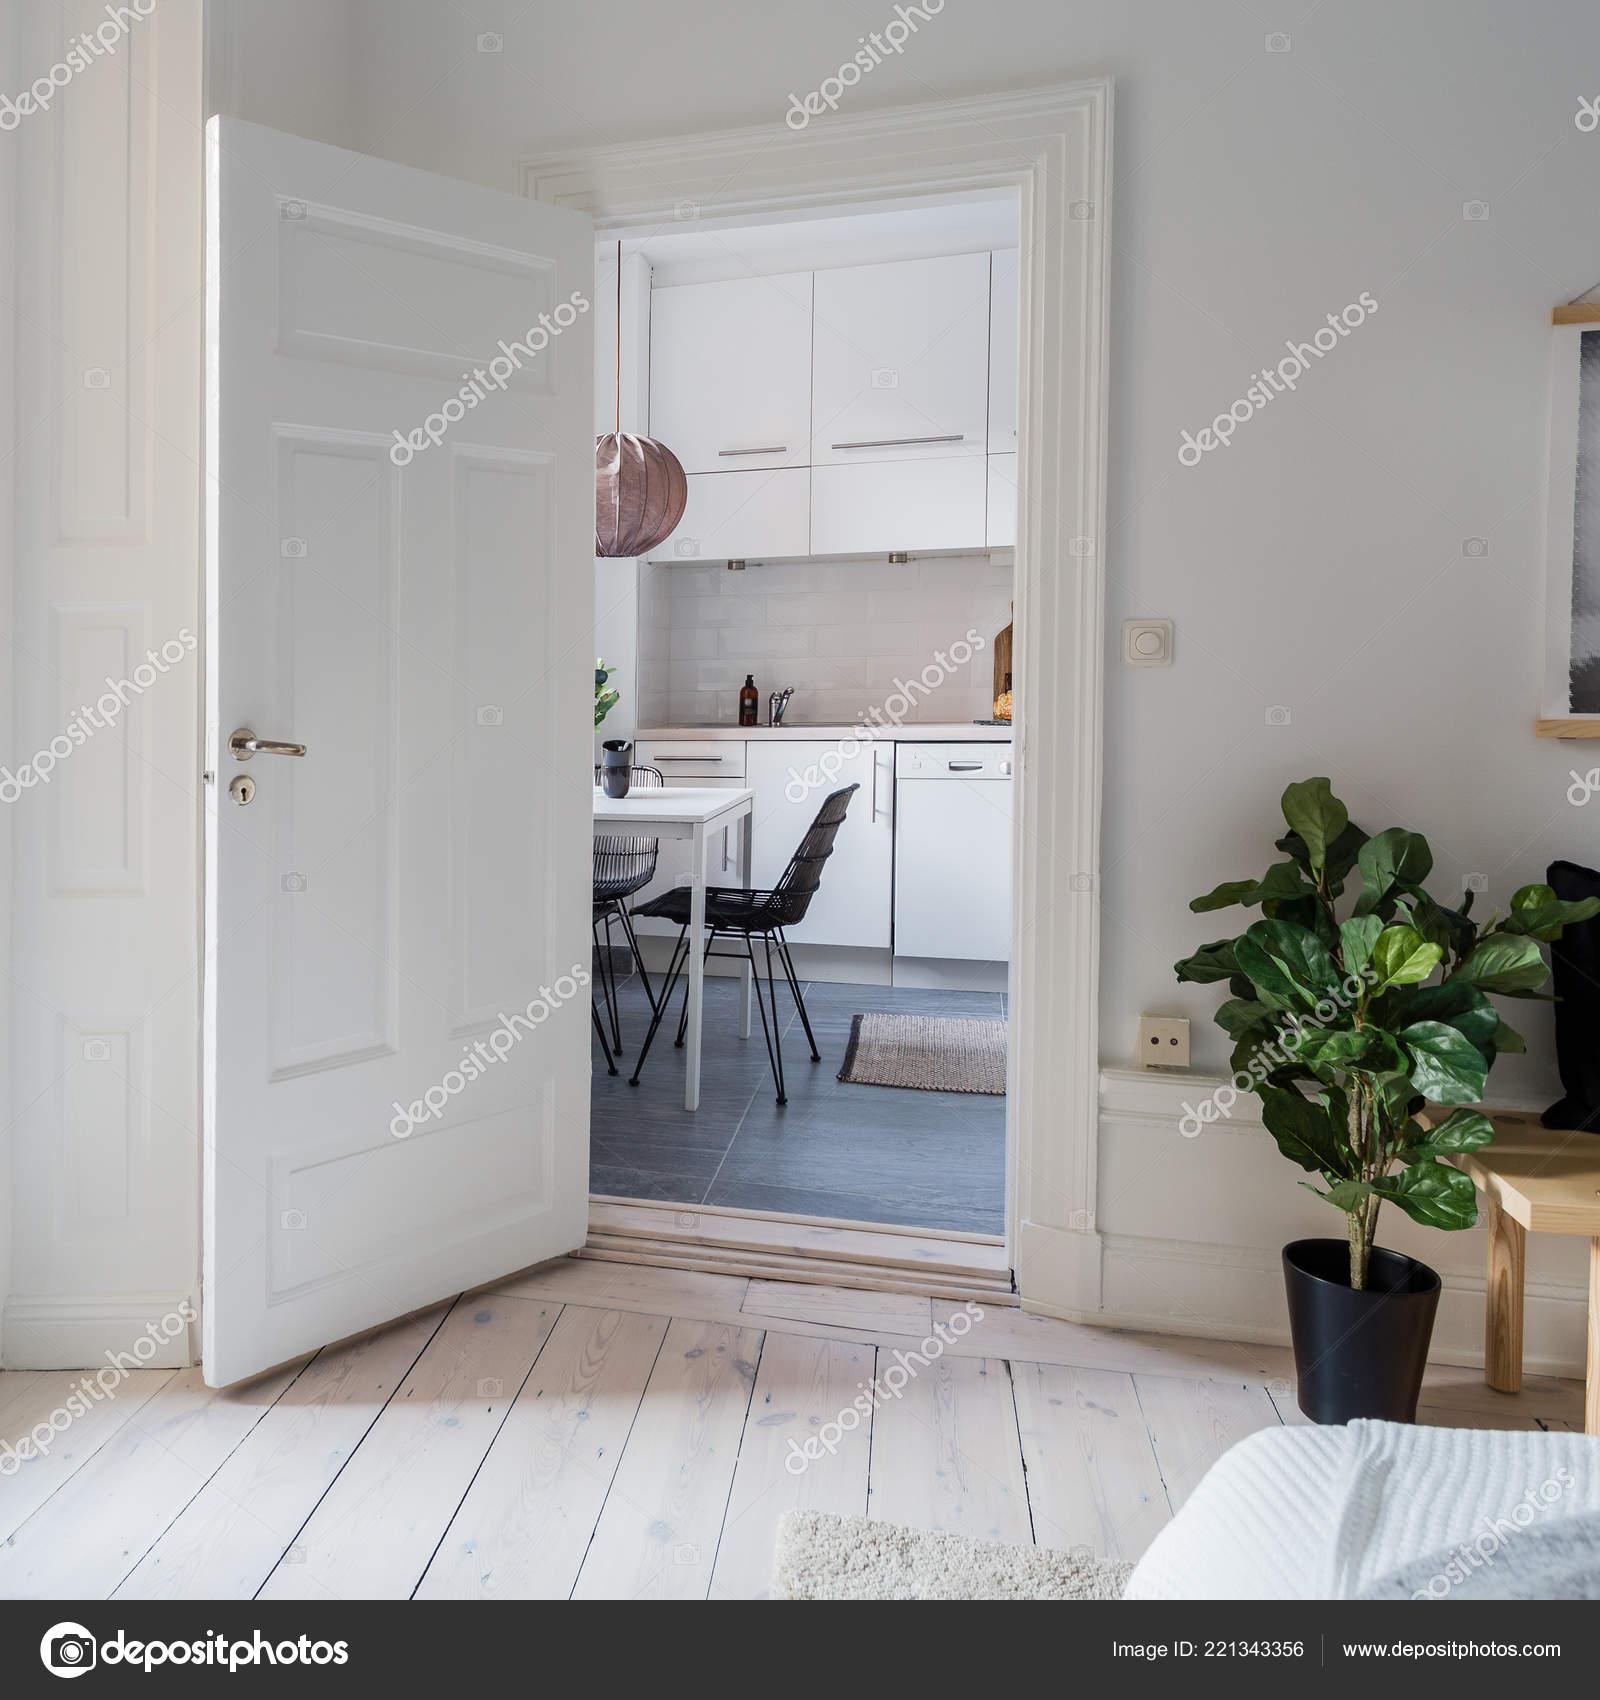 small table for kitchen mobile islands 花式厨房横幅小桌子窗口 图库照片 c annaanderssonphotography 221343356